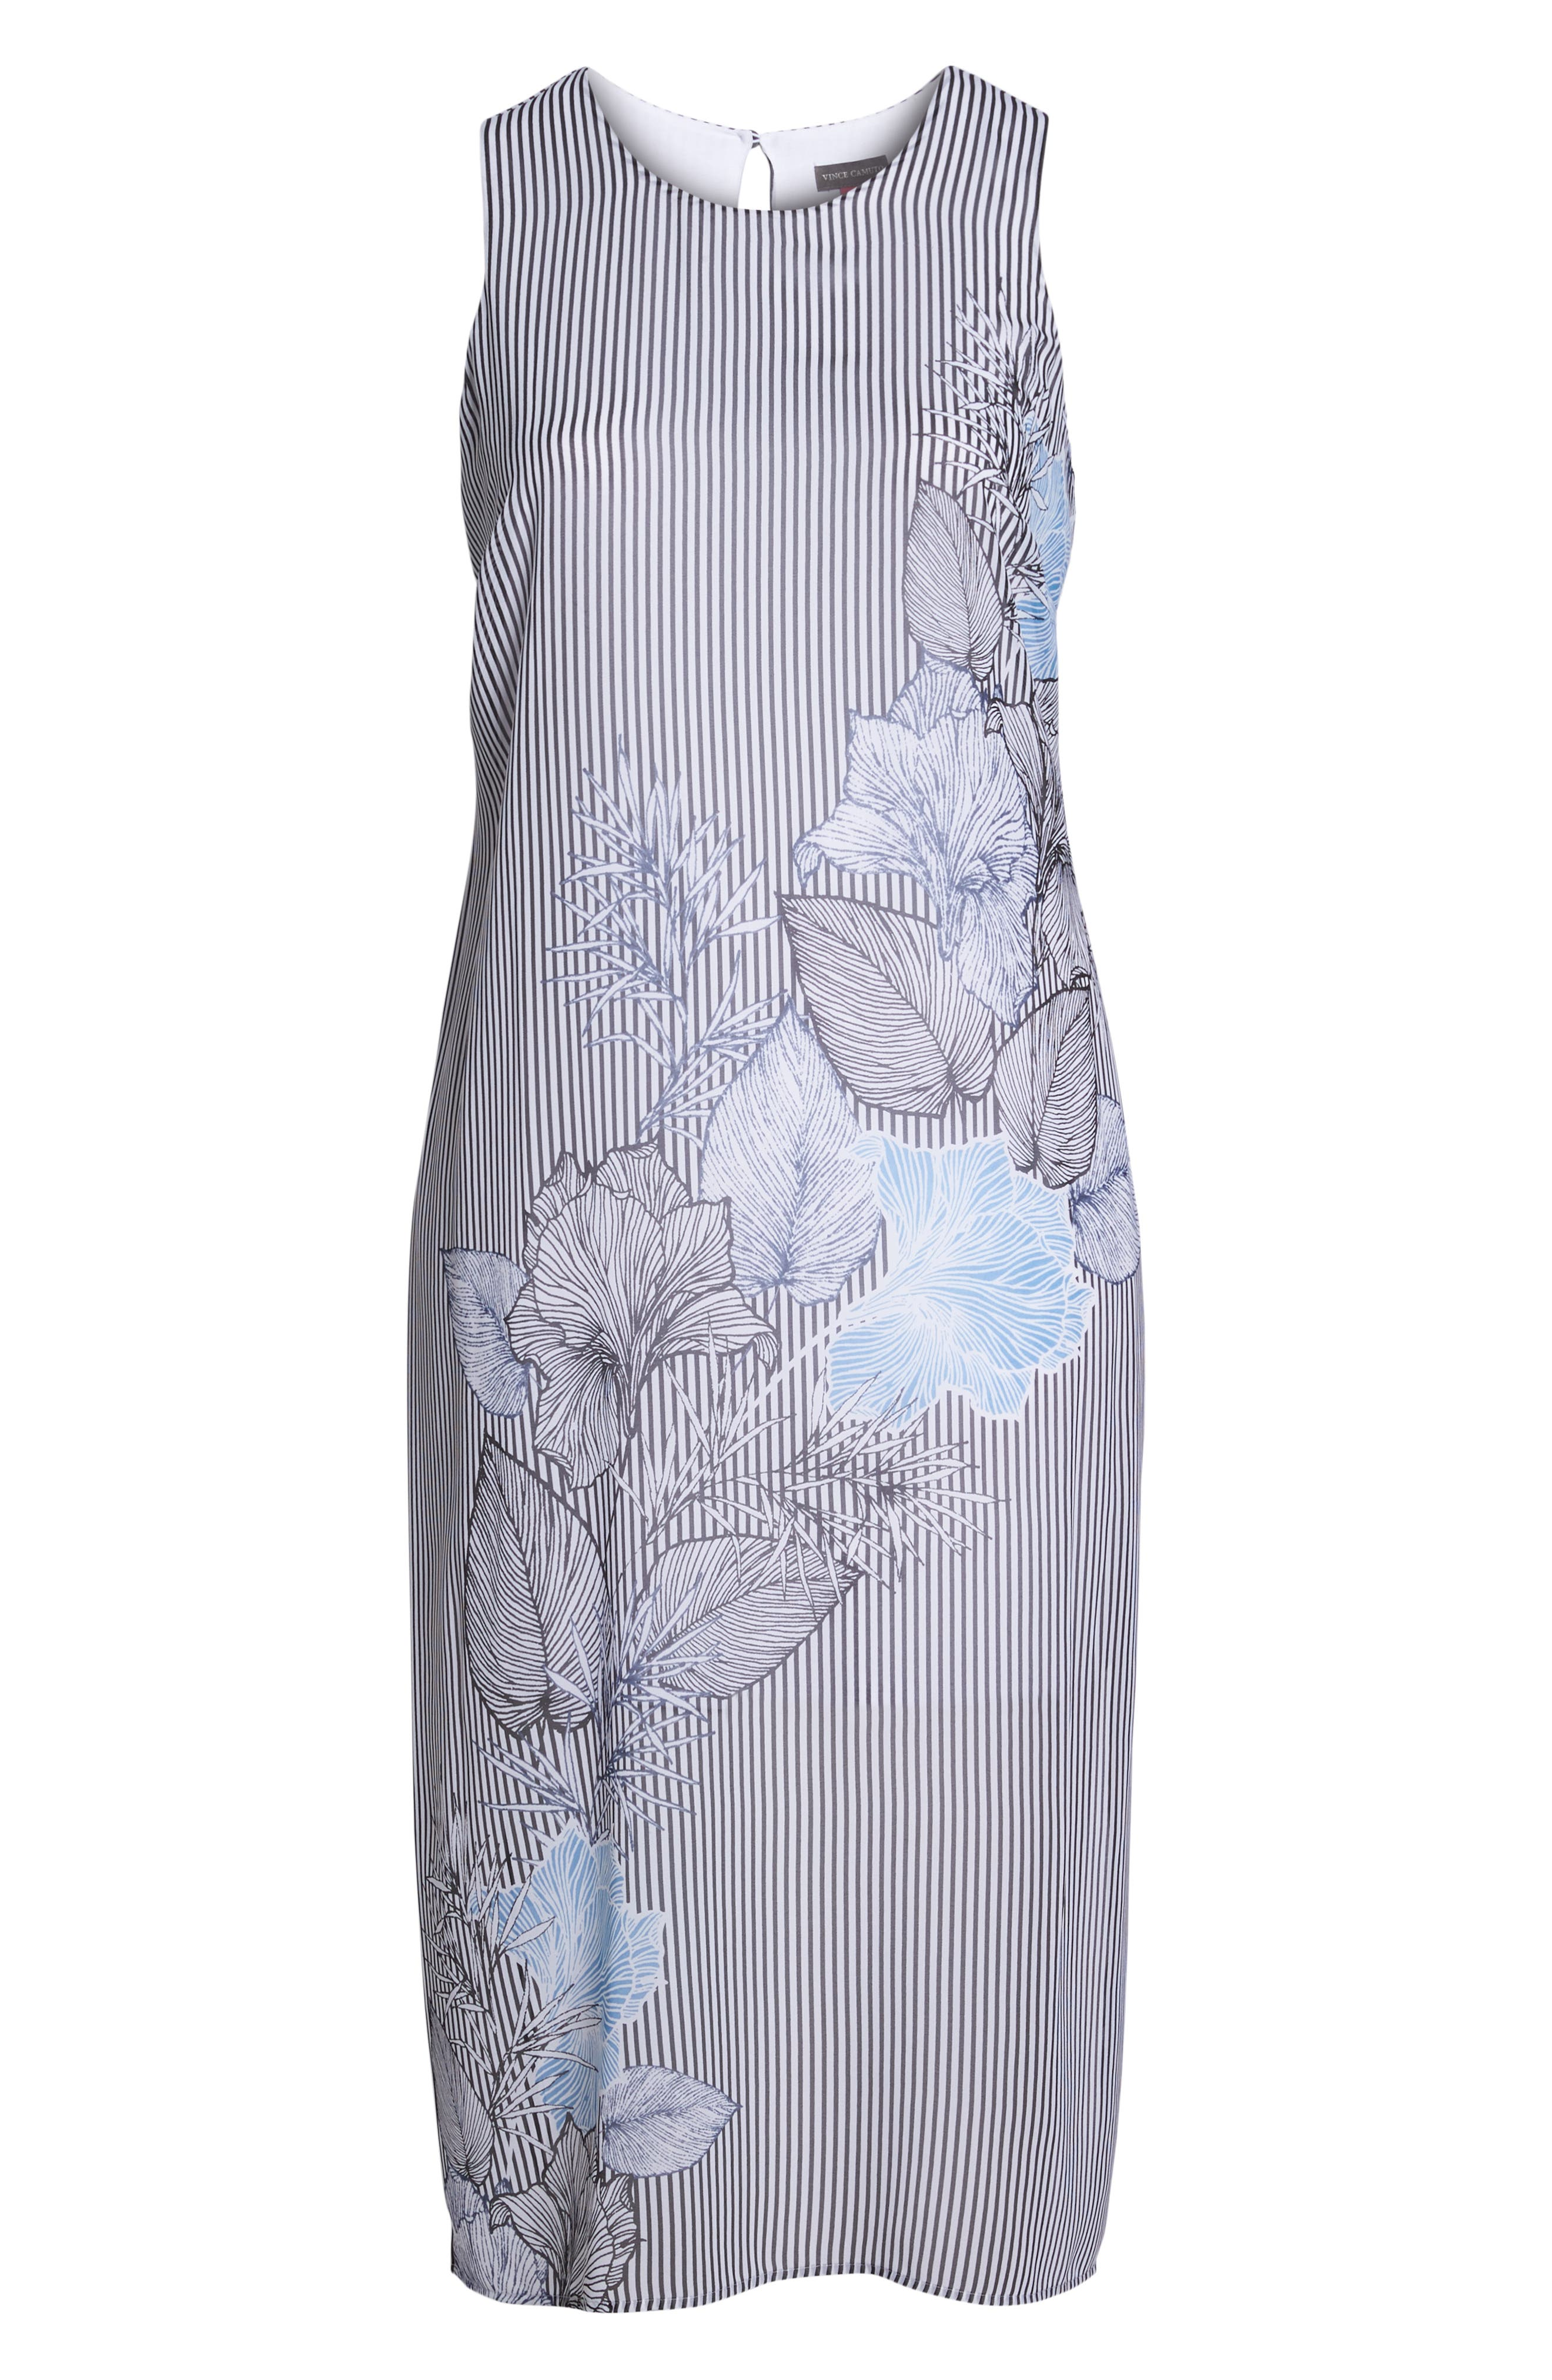 Island Floral Chiffon Maxi Dress,                             Alternate thumbnail 7, color,                             010